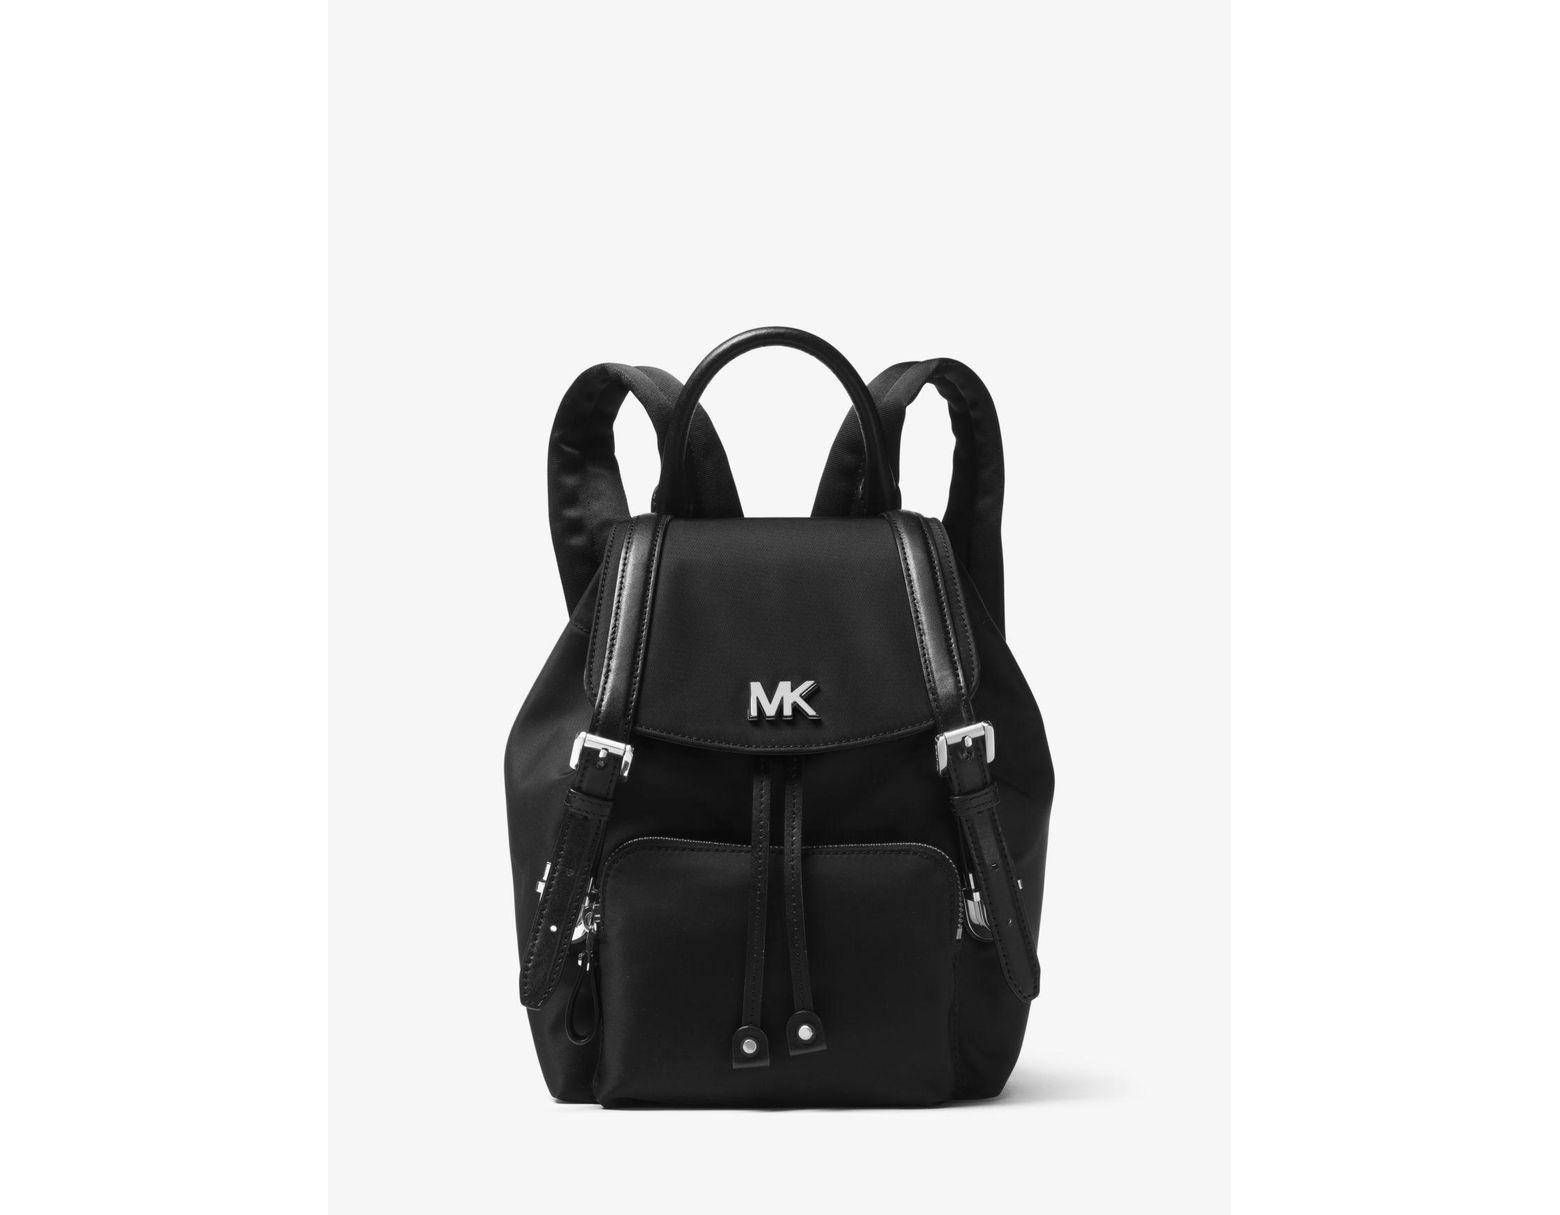 59c6dda01e5c Michael Kors Beacon Small Nylon Backpack in Black - Save 25% - Lyst